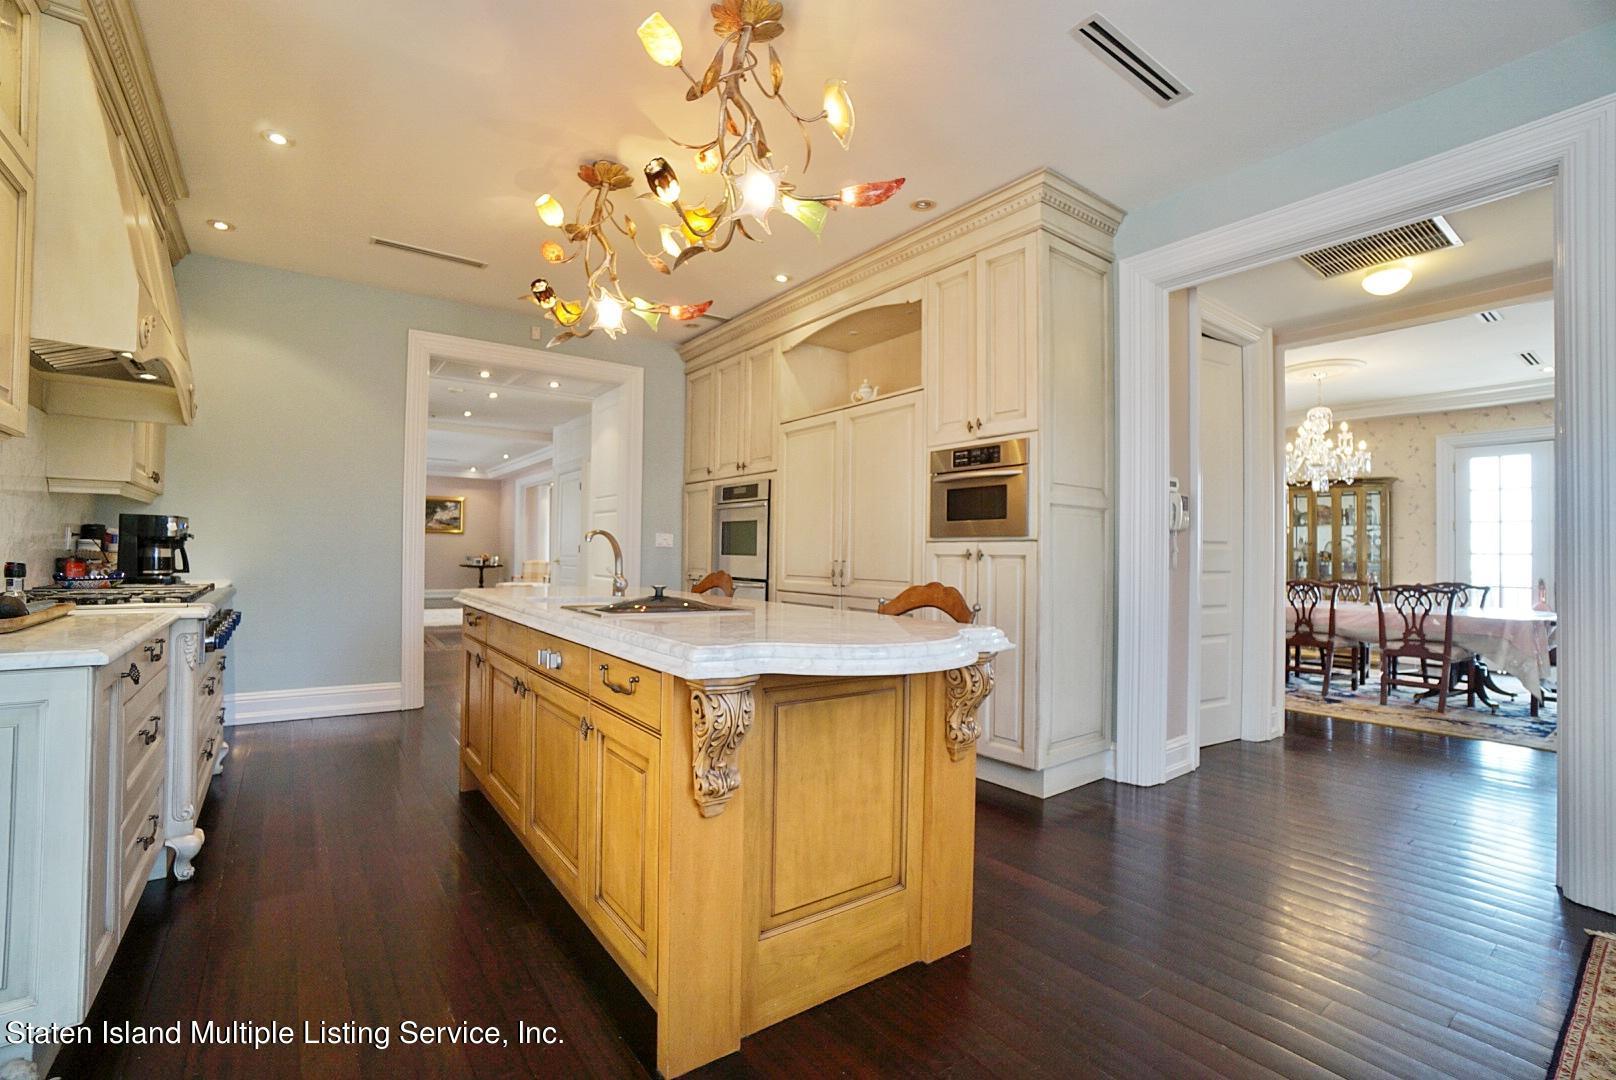 Single Family - Detached 129 Coverly Avenue   Staten Island, NY 10301, MLS-1144490-24